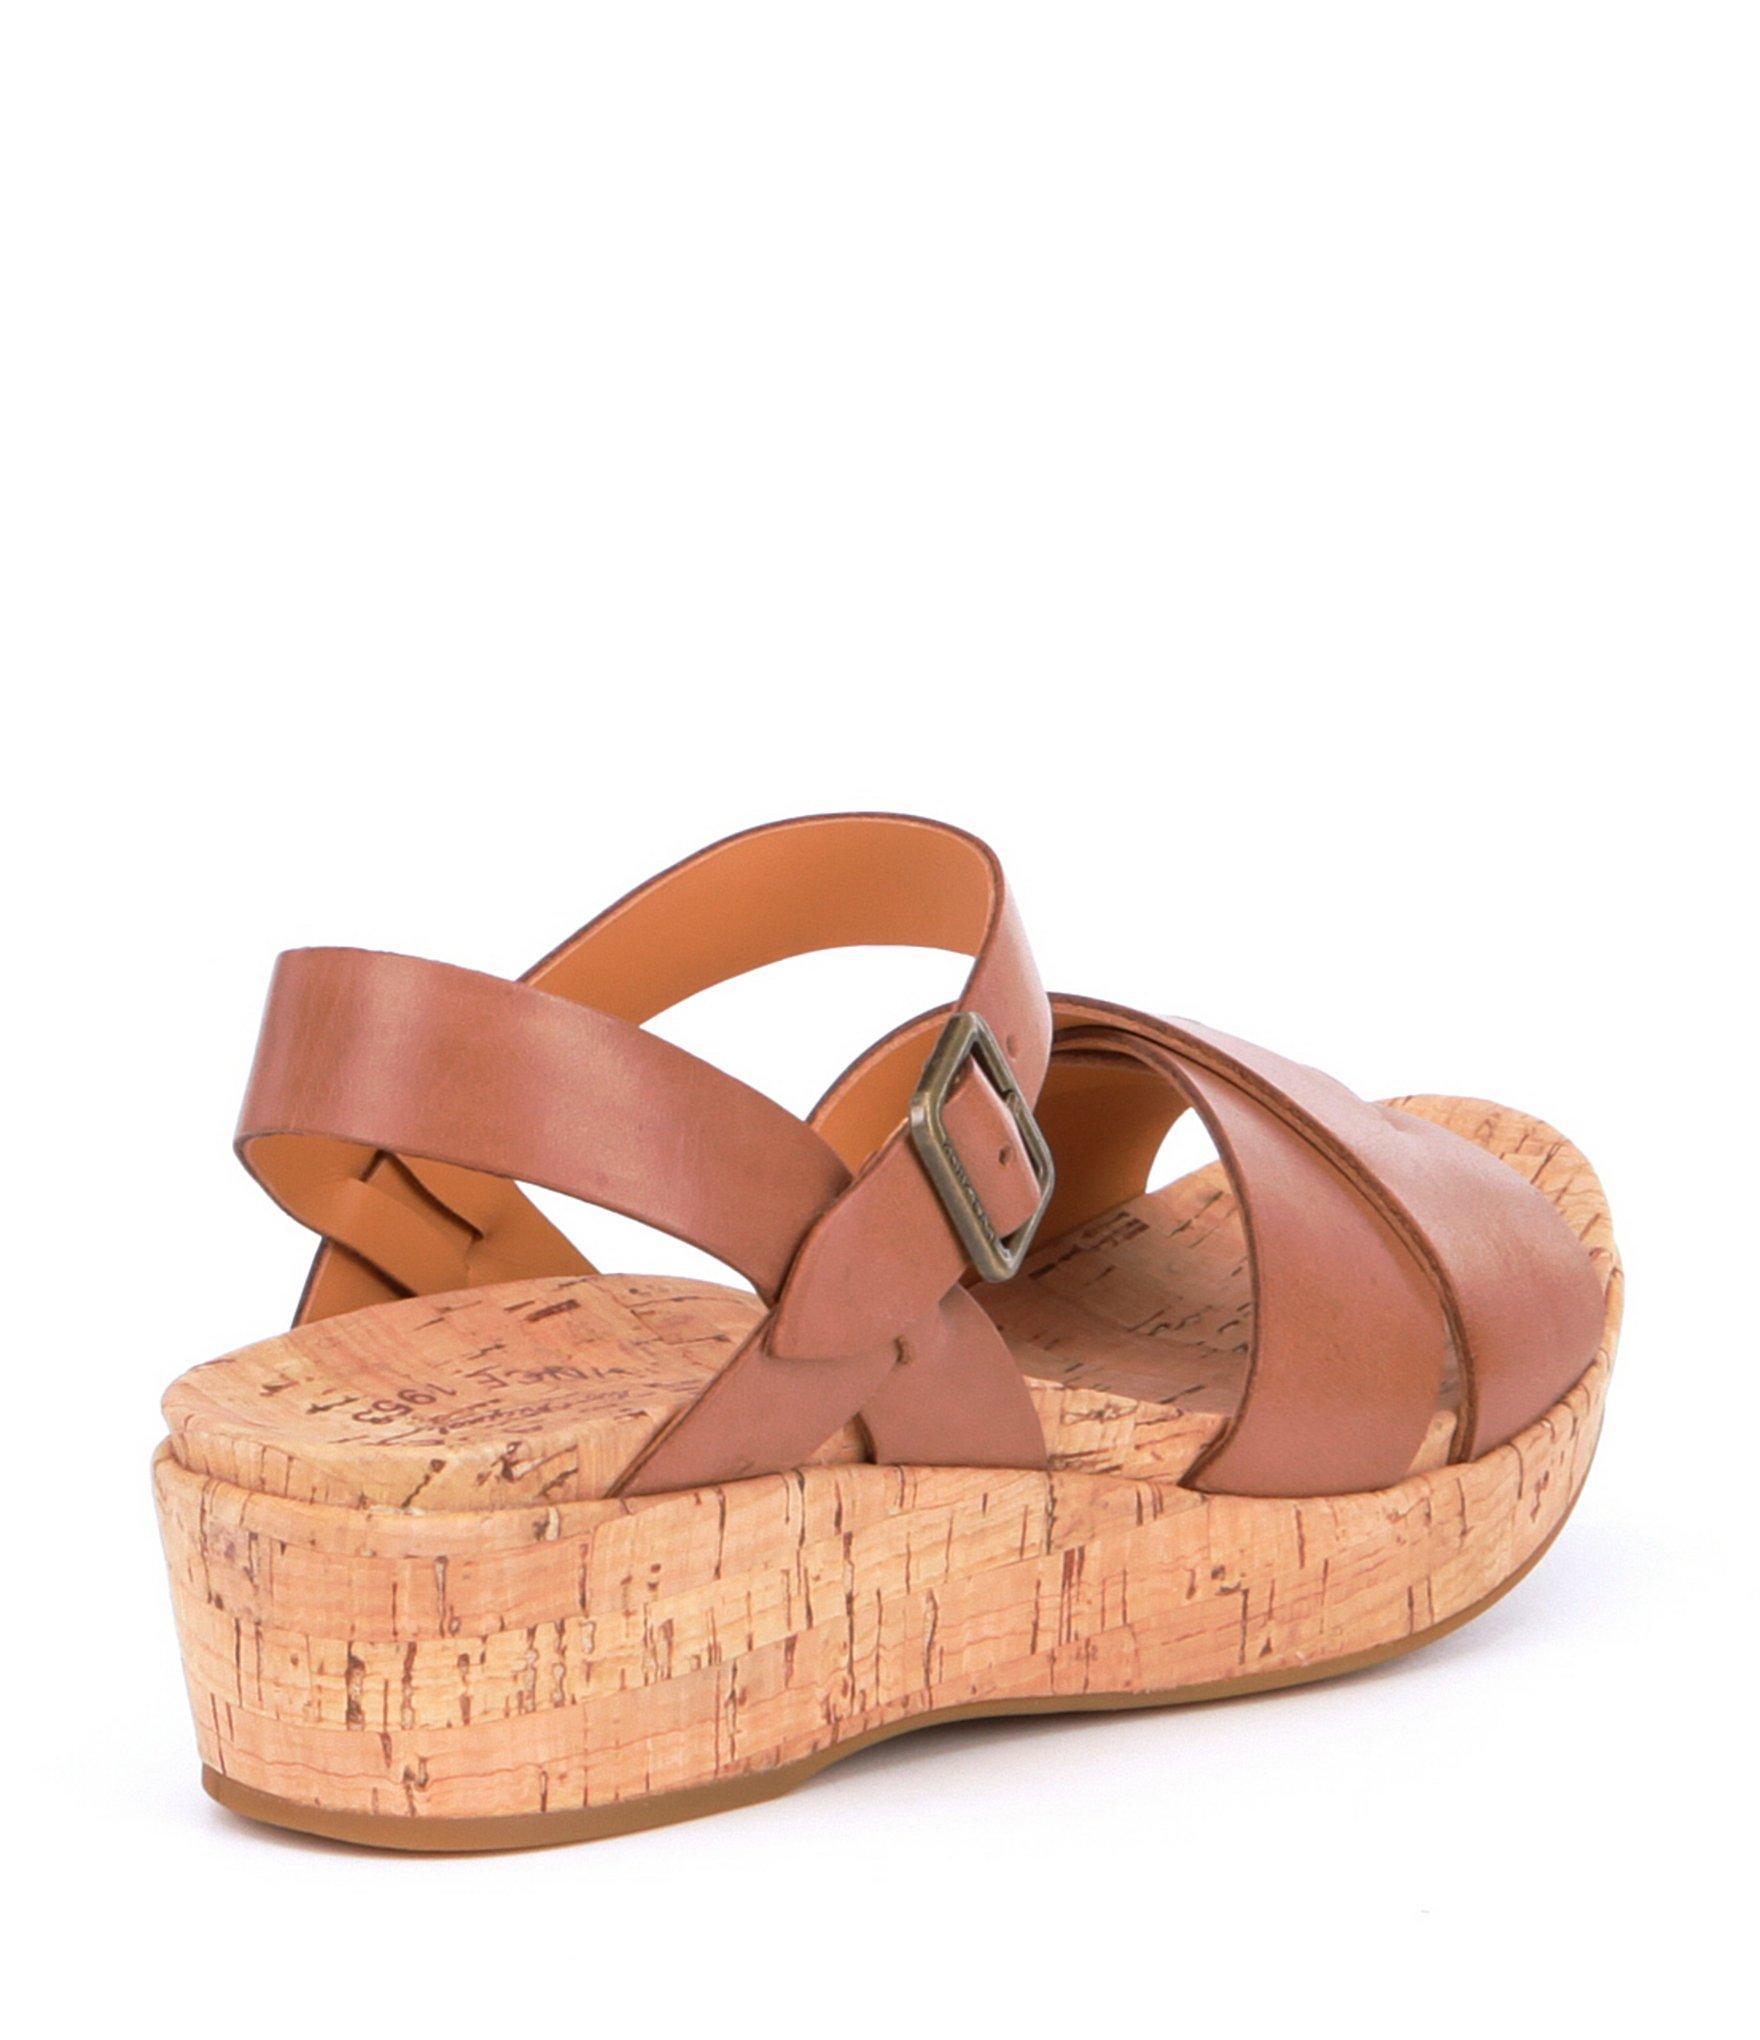 829b37436ab4 Kork-Ease - Brown Myrna Ankle Strap Banded Leather   Cork Sandals - Lyst.  View fullscreen